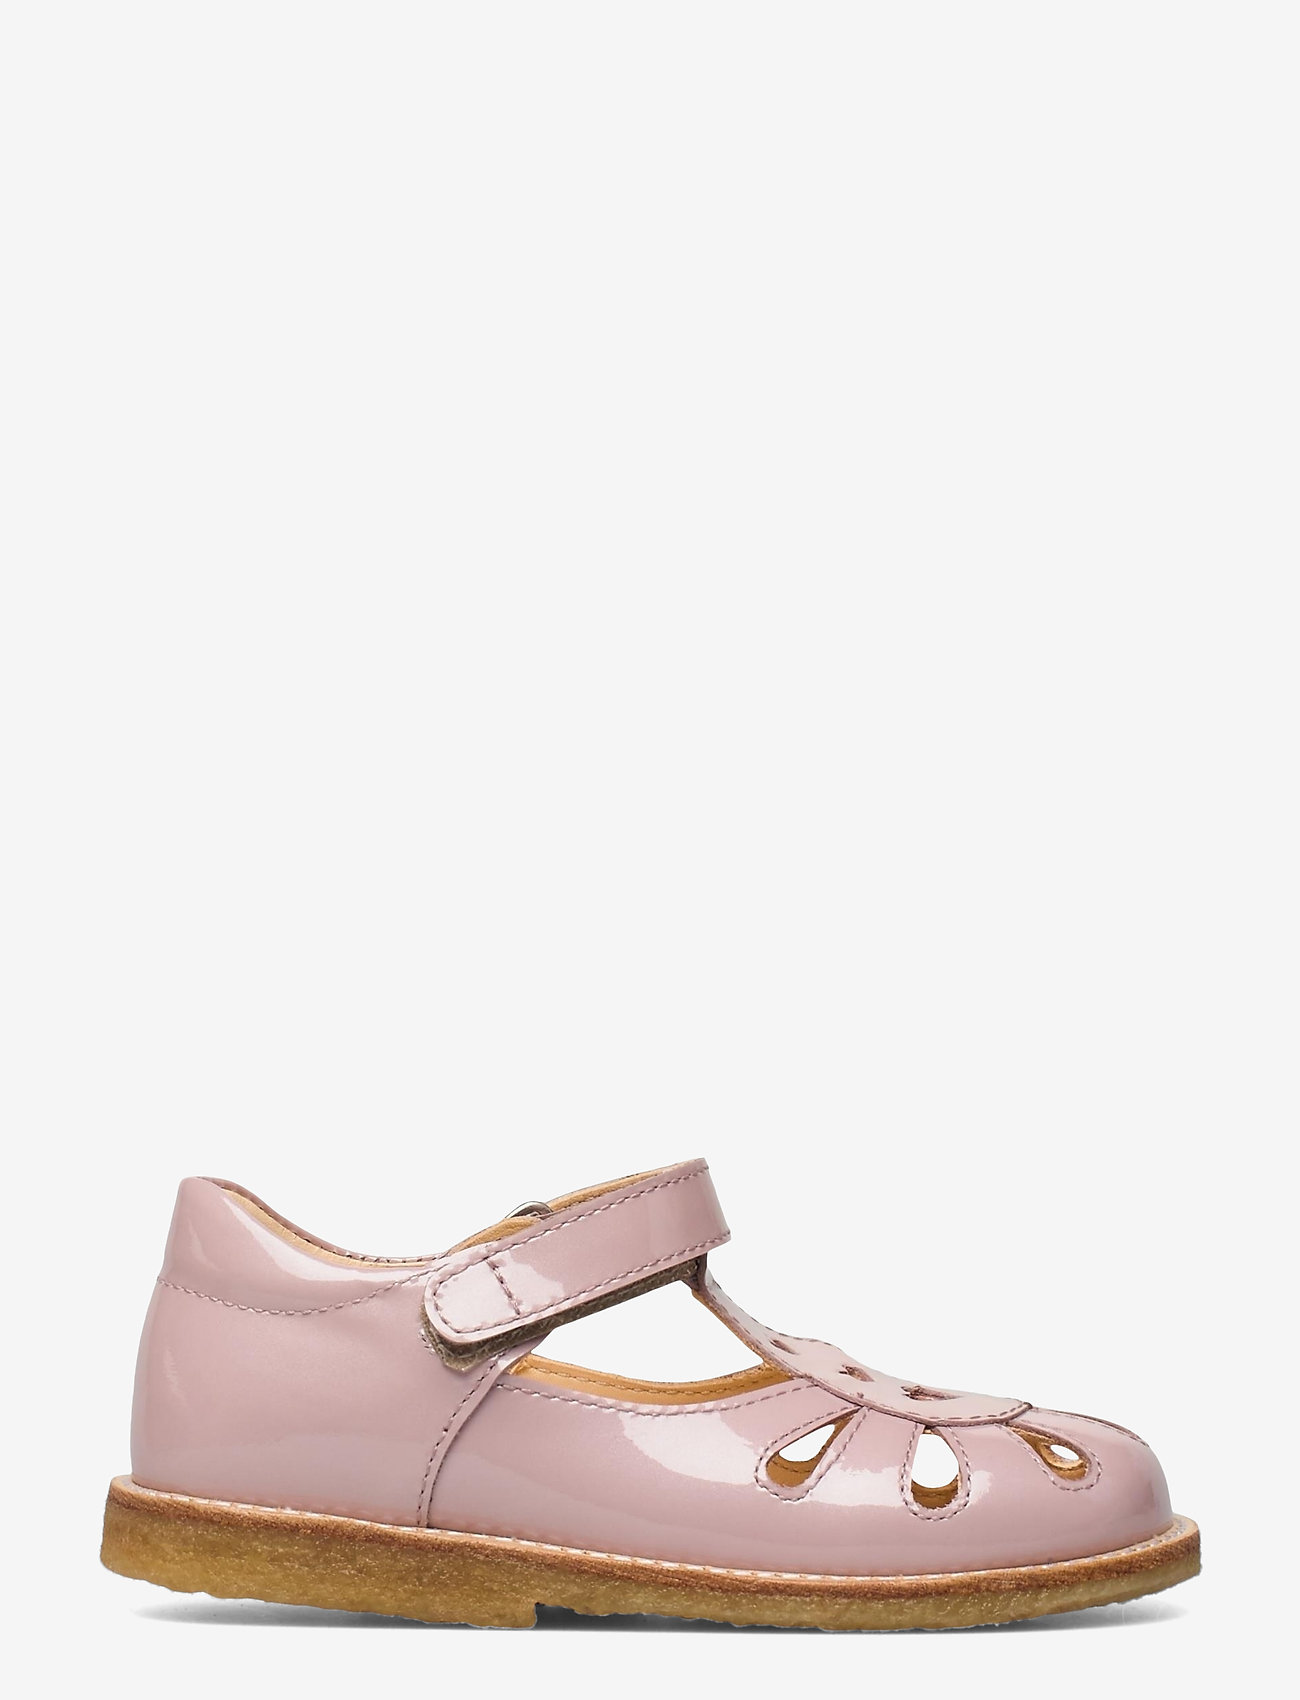 ANGULUS - Sandals - flat - closed toe -  - siksniņu sandales - 2354 pale rose - 1